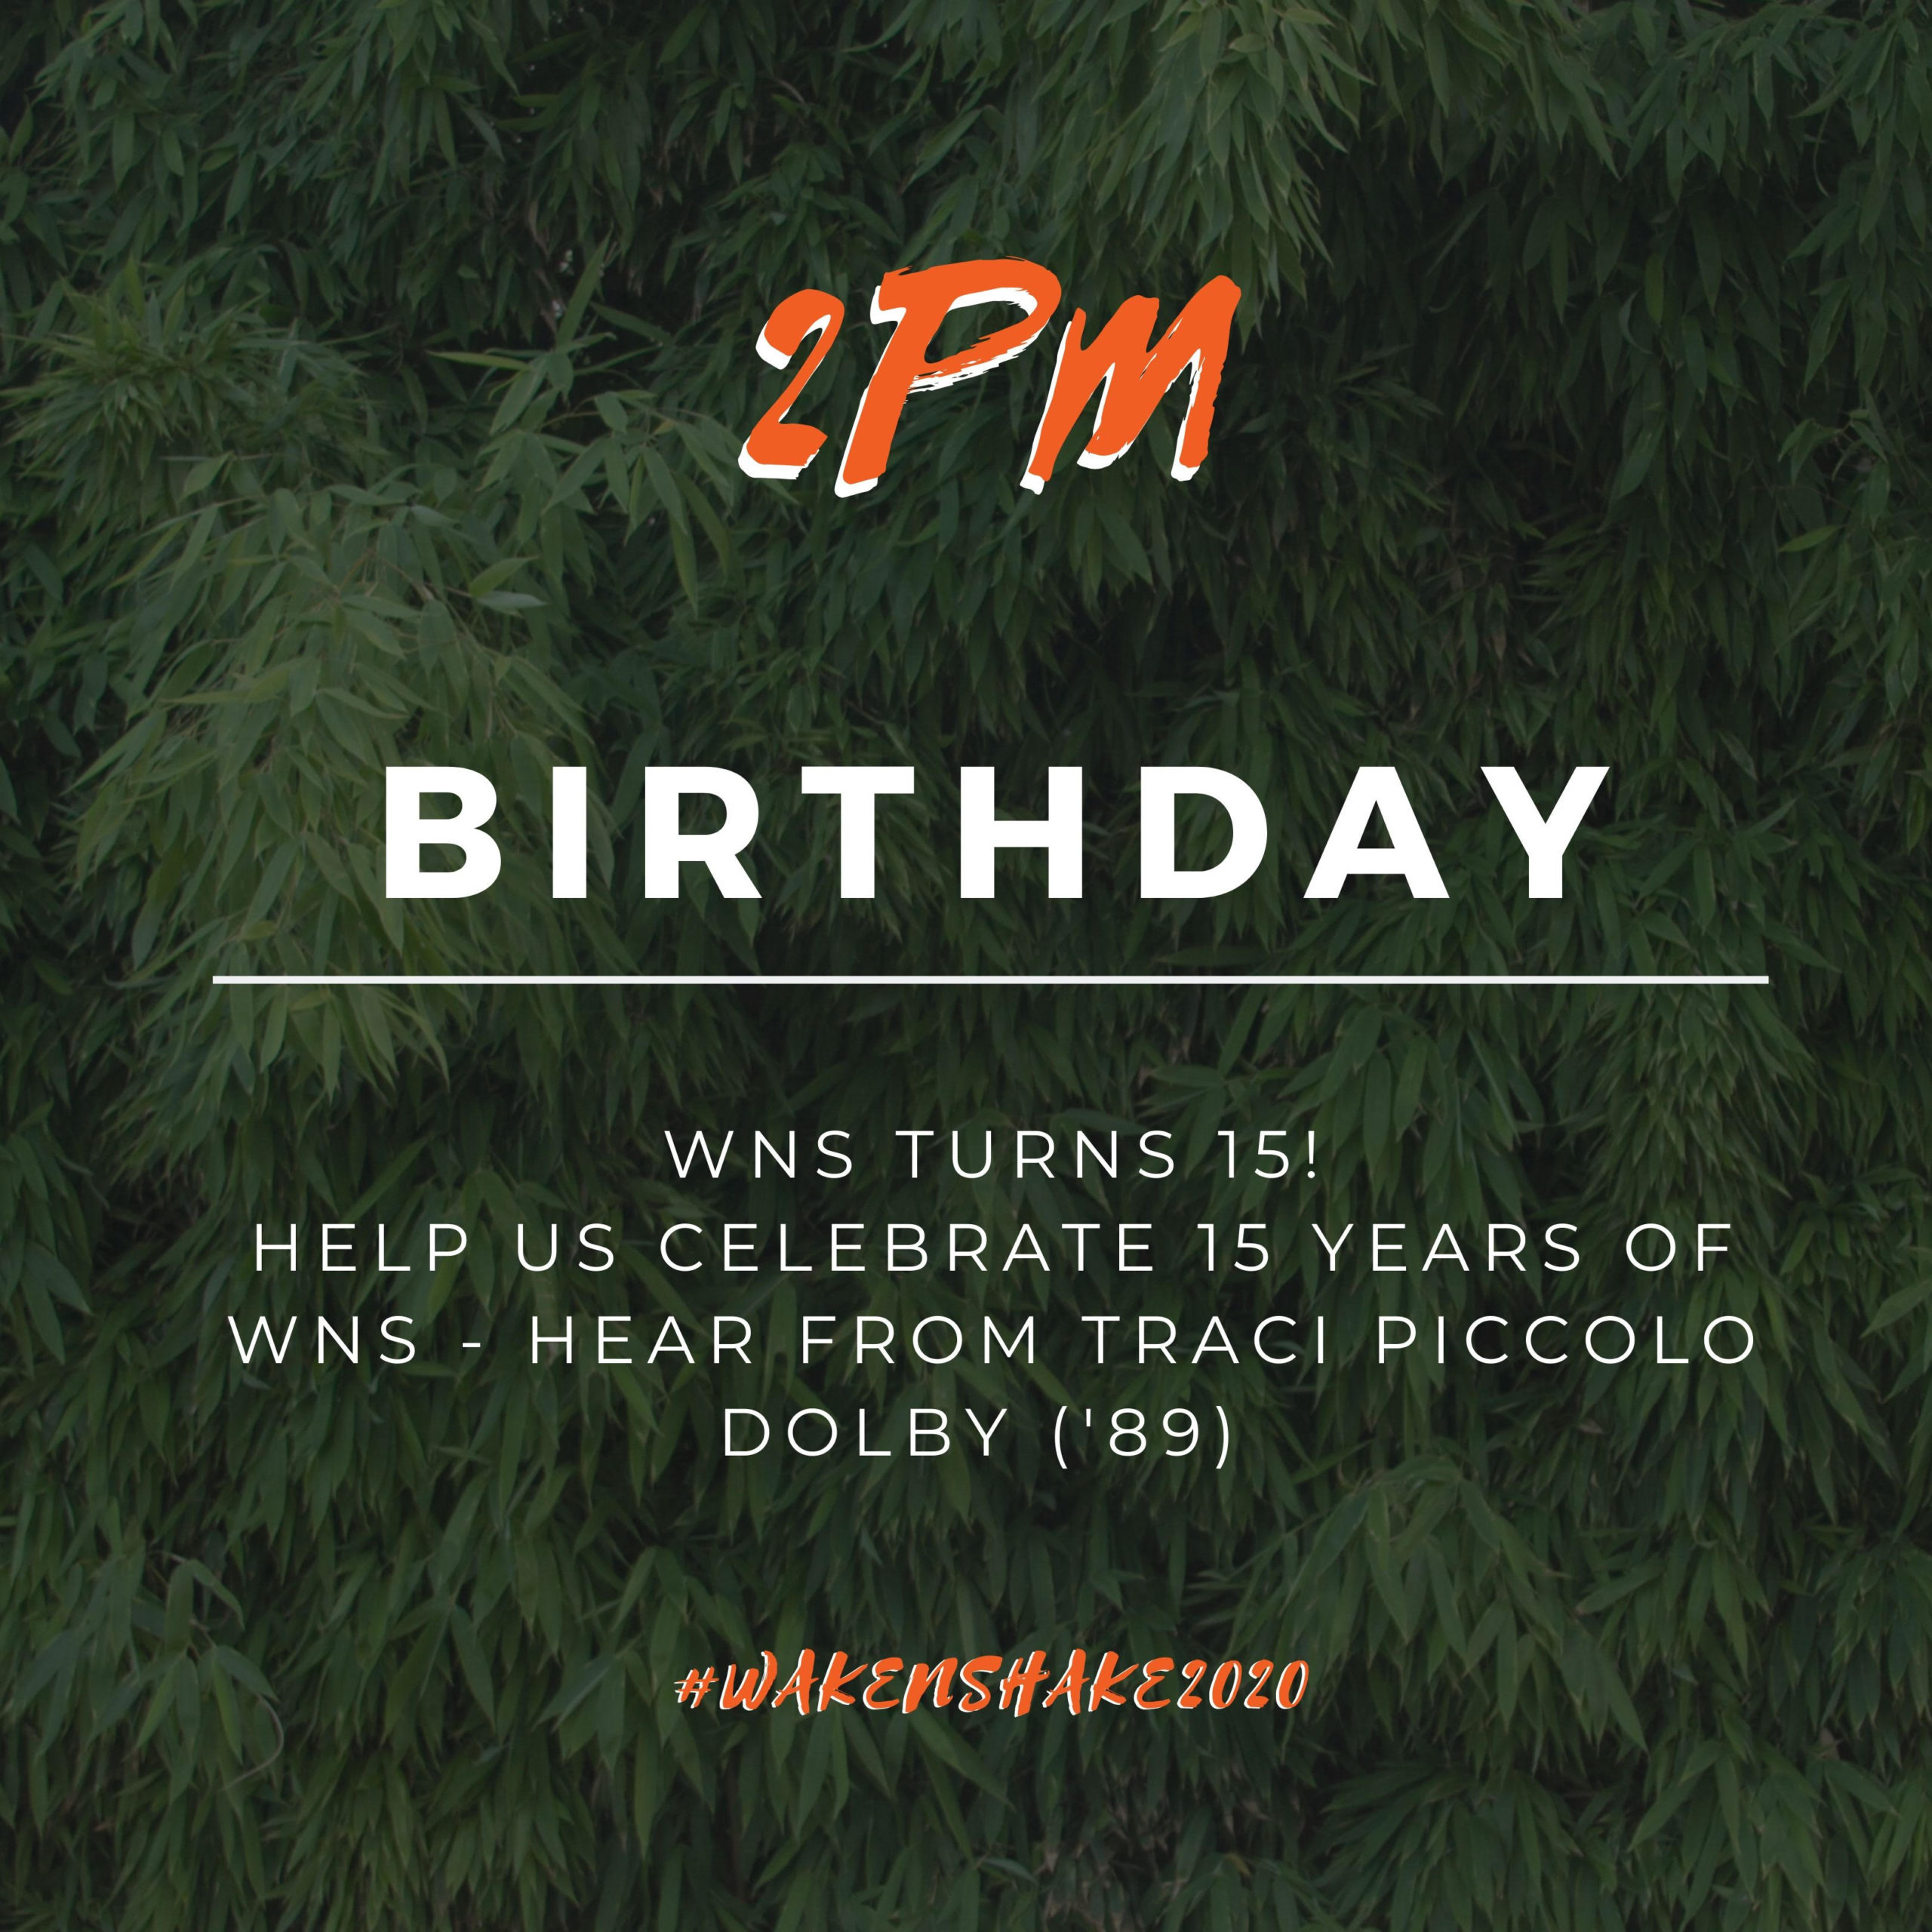 2 PM - Birthday